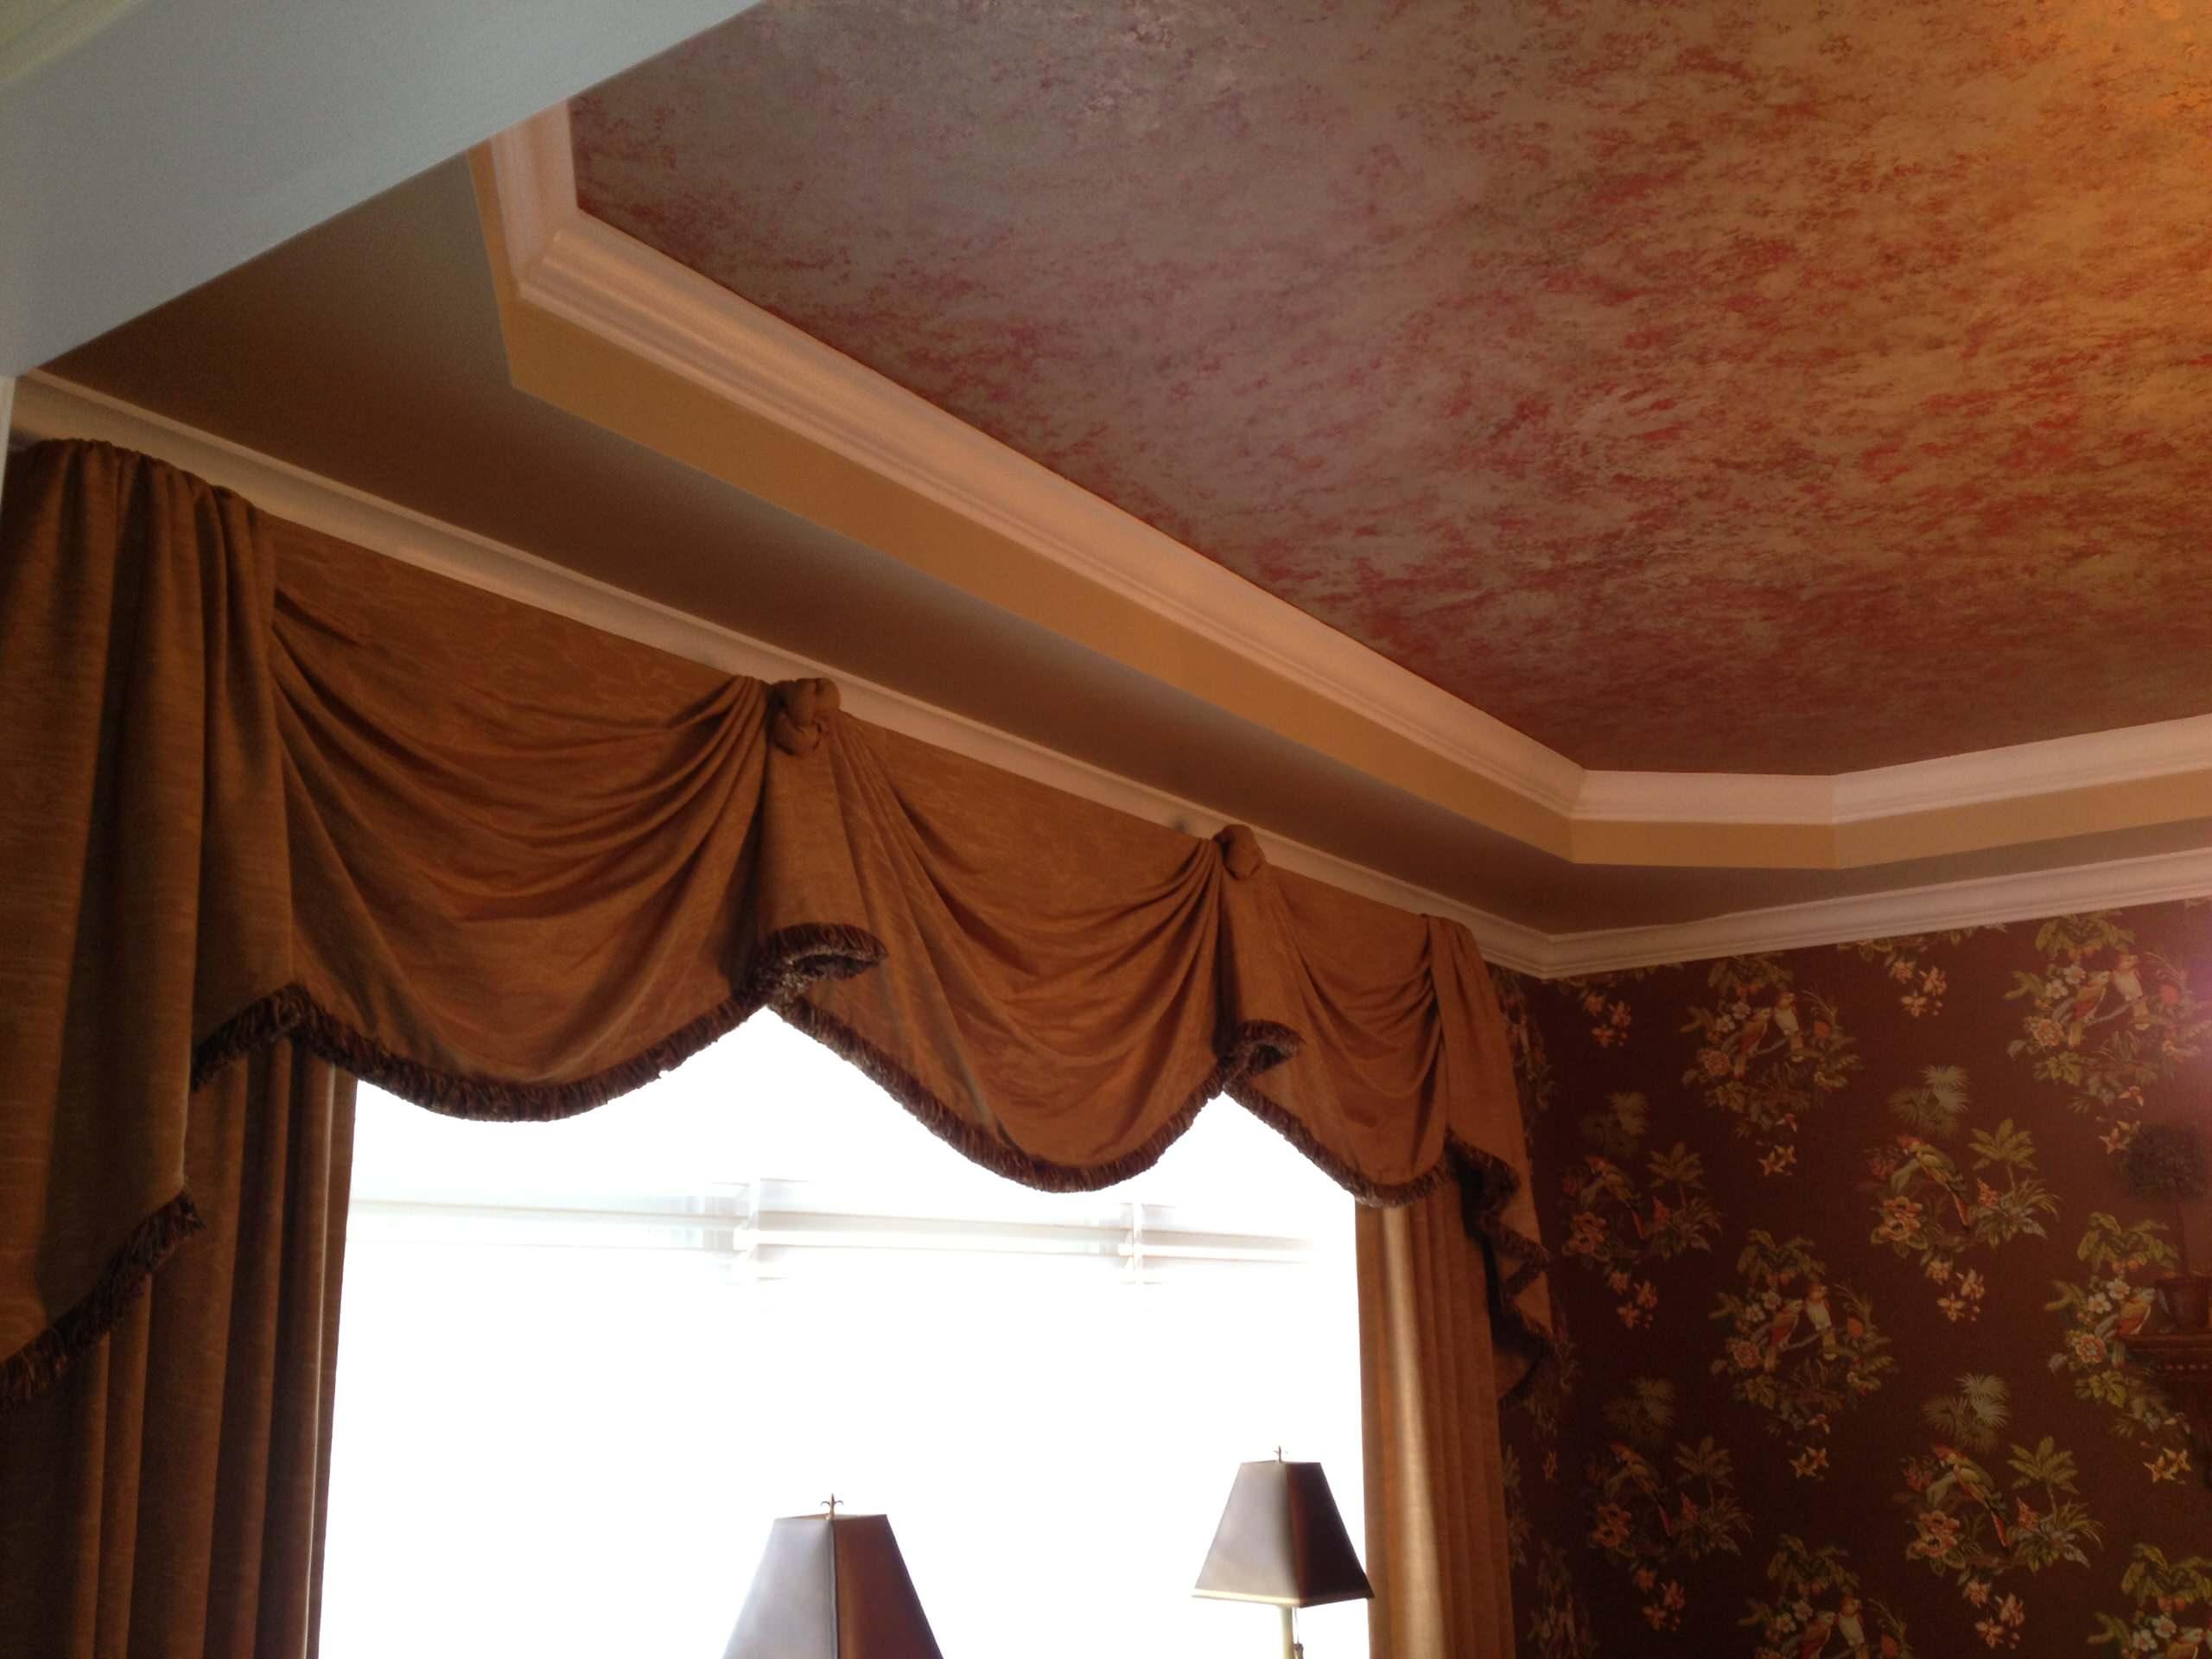 Valence window treatments